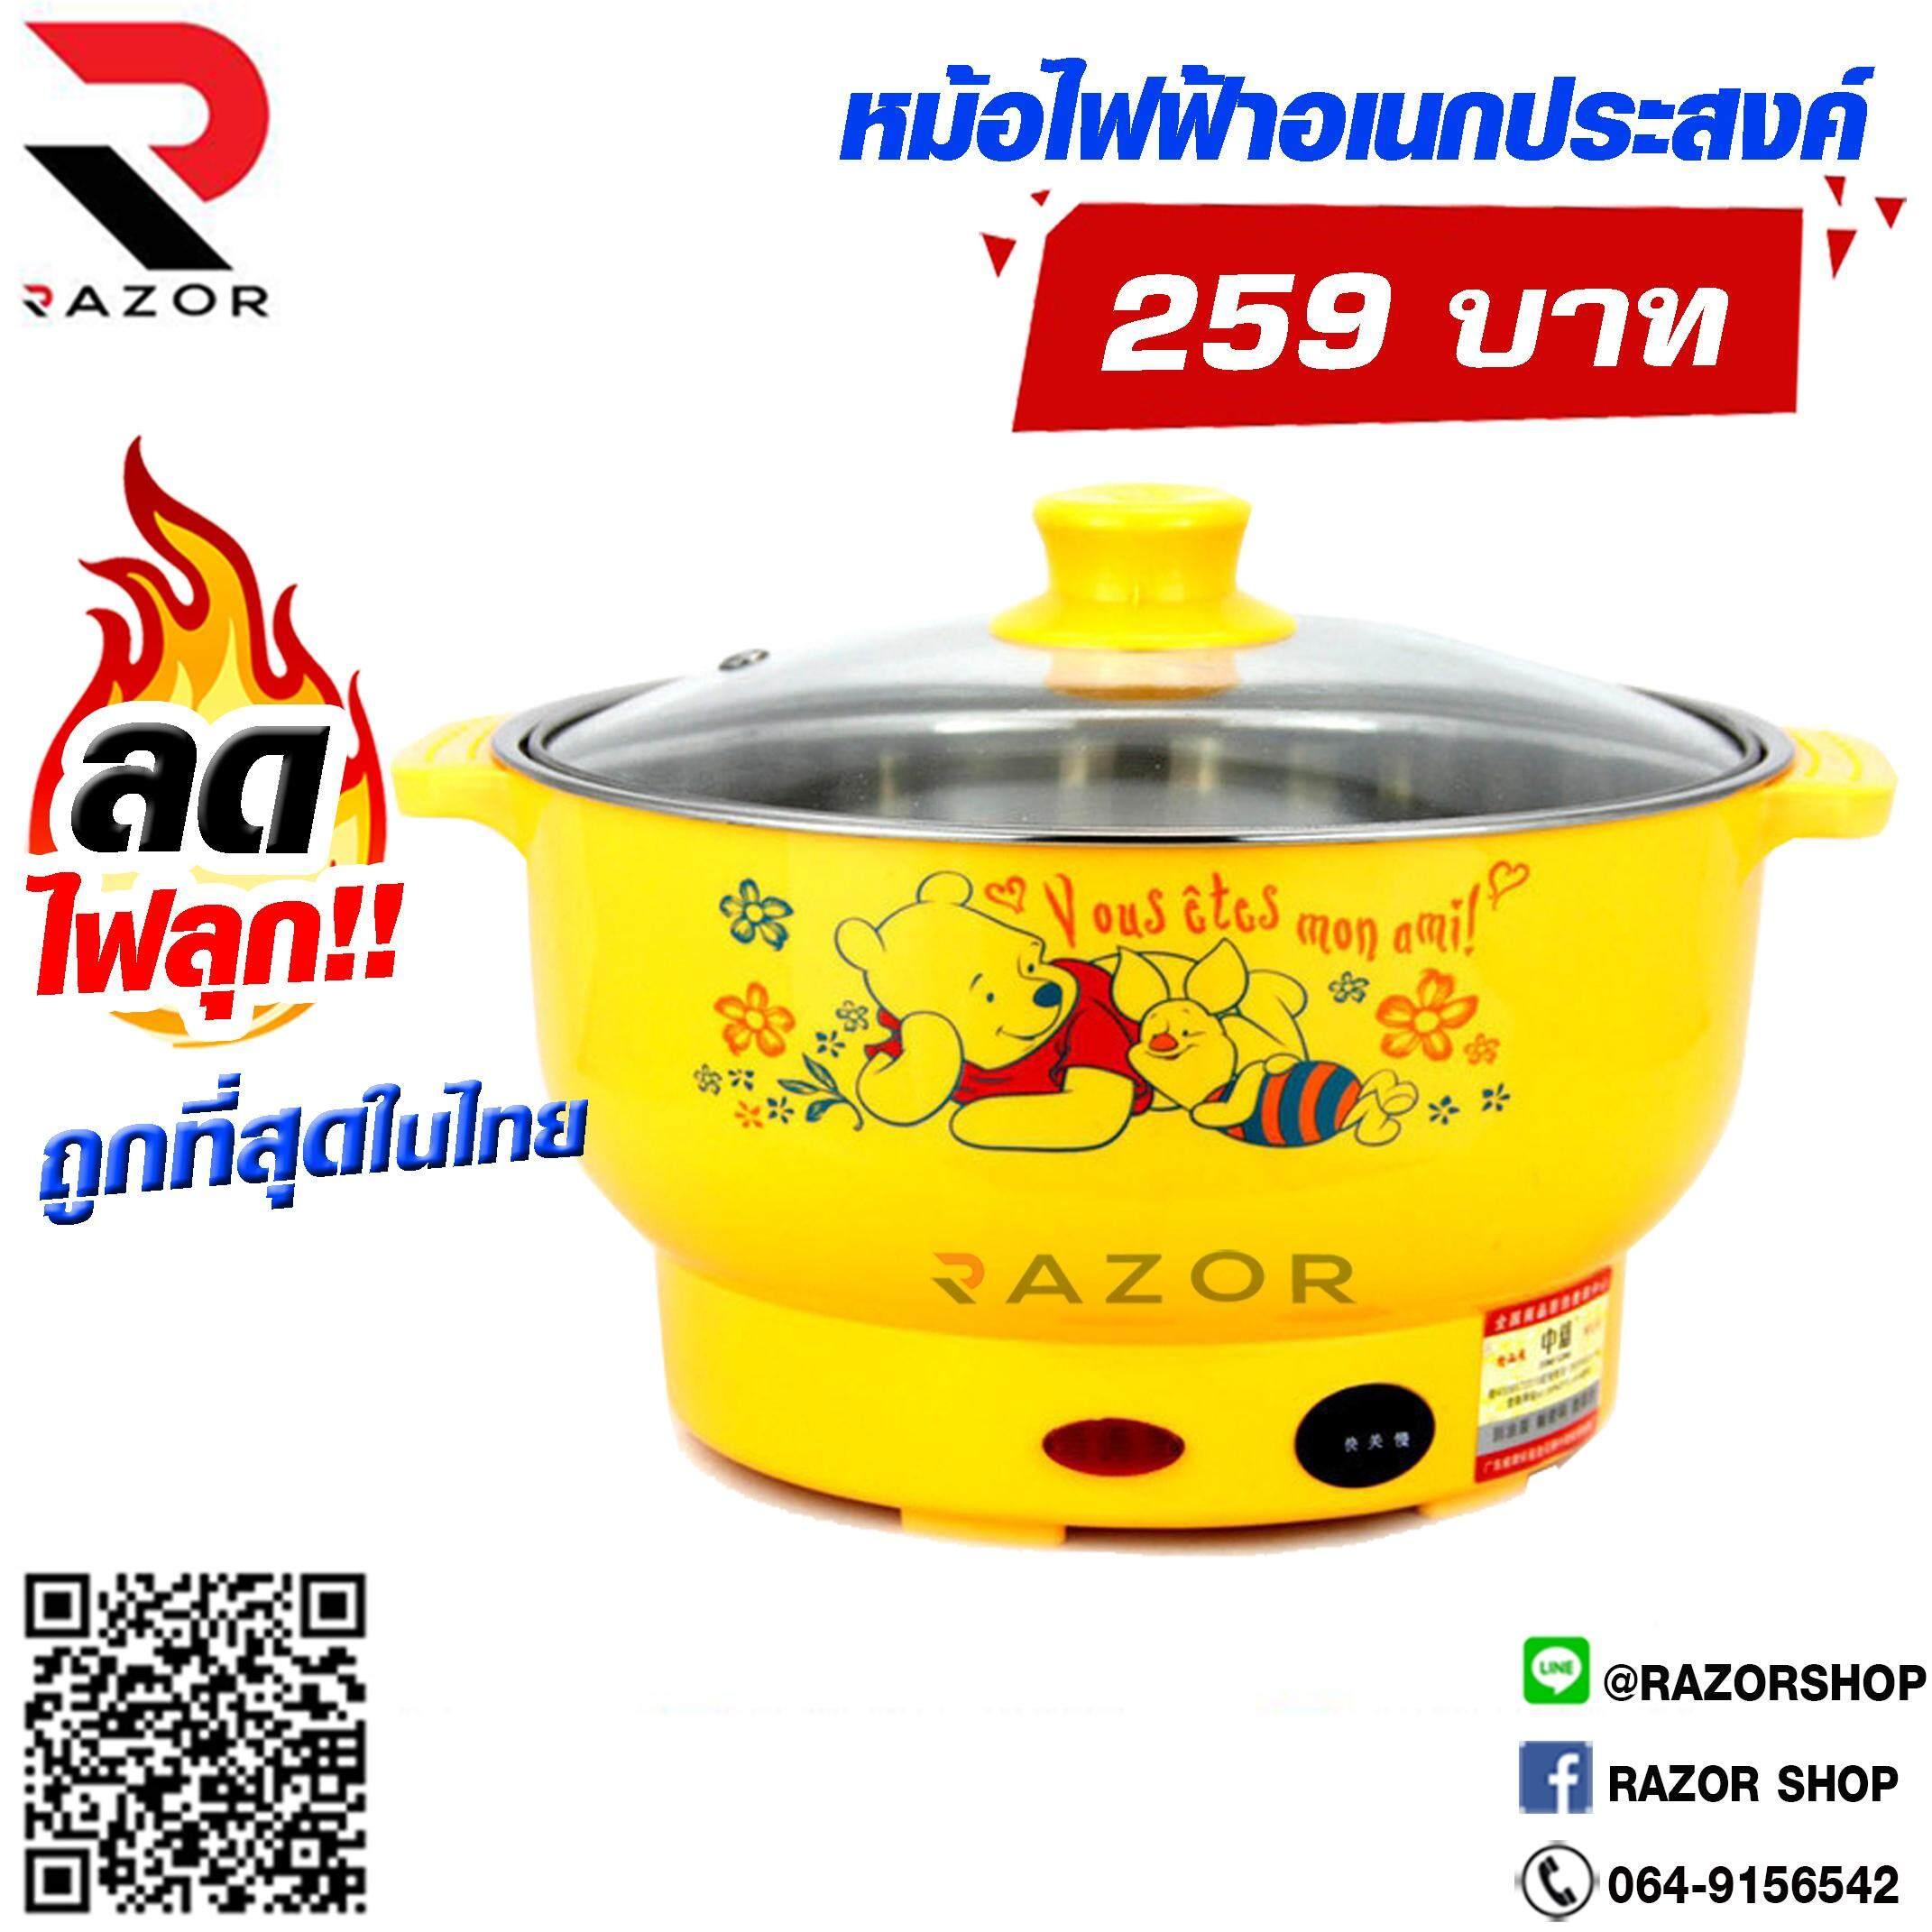 ausway royal jelly pantip